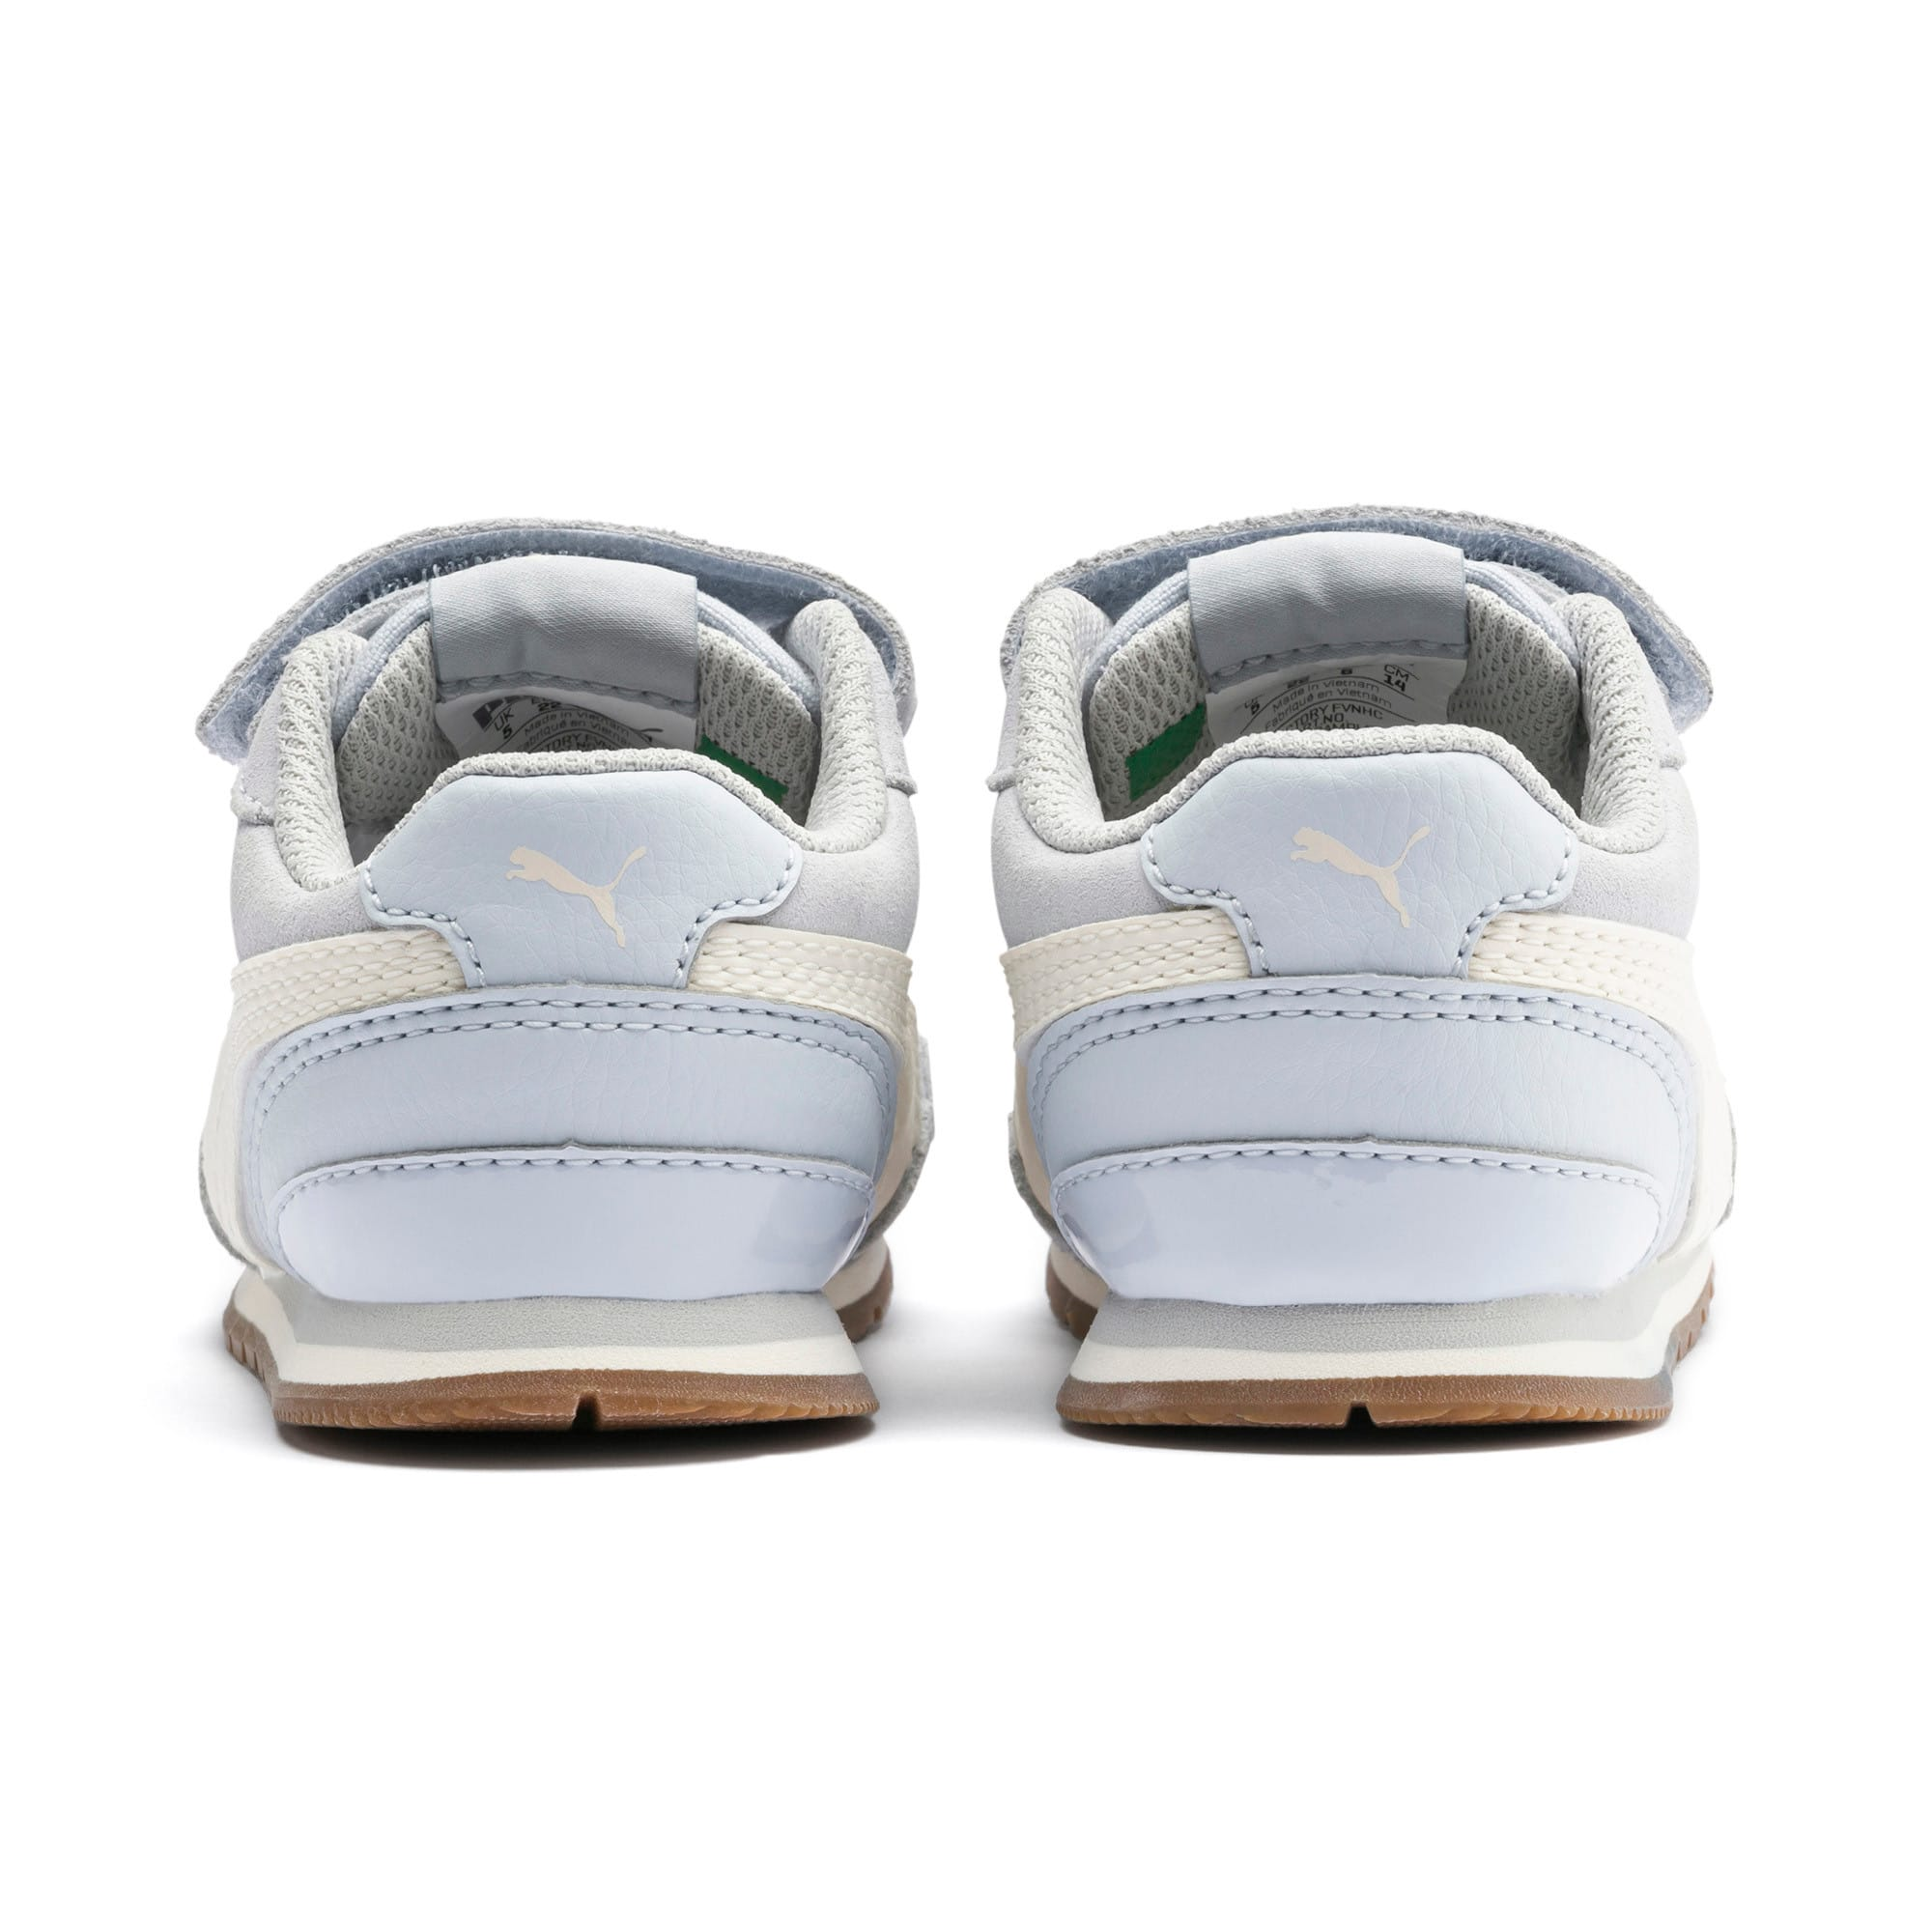 Miniatura 3 de Zapatos ST Runner v2 Suede para bebé, Heather-Whisper White, mediano